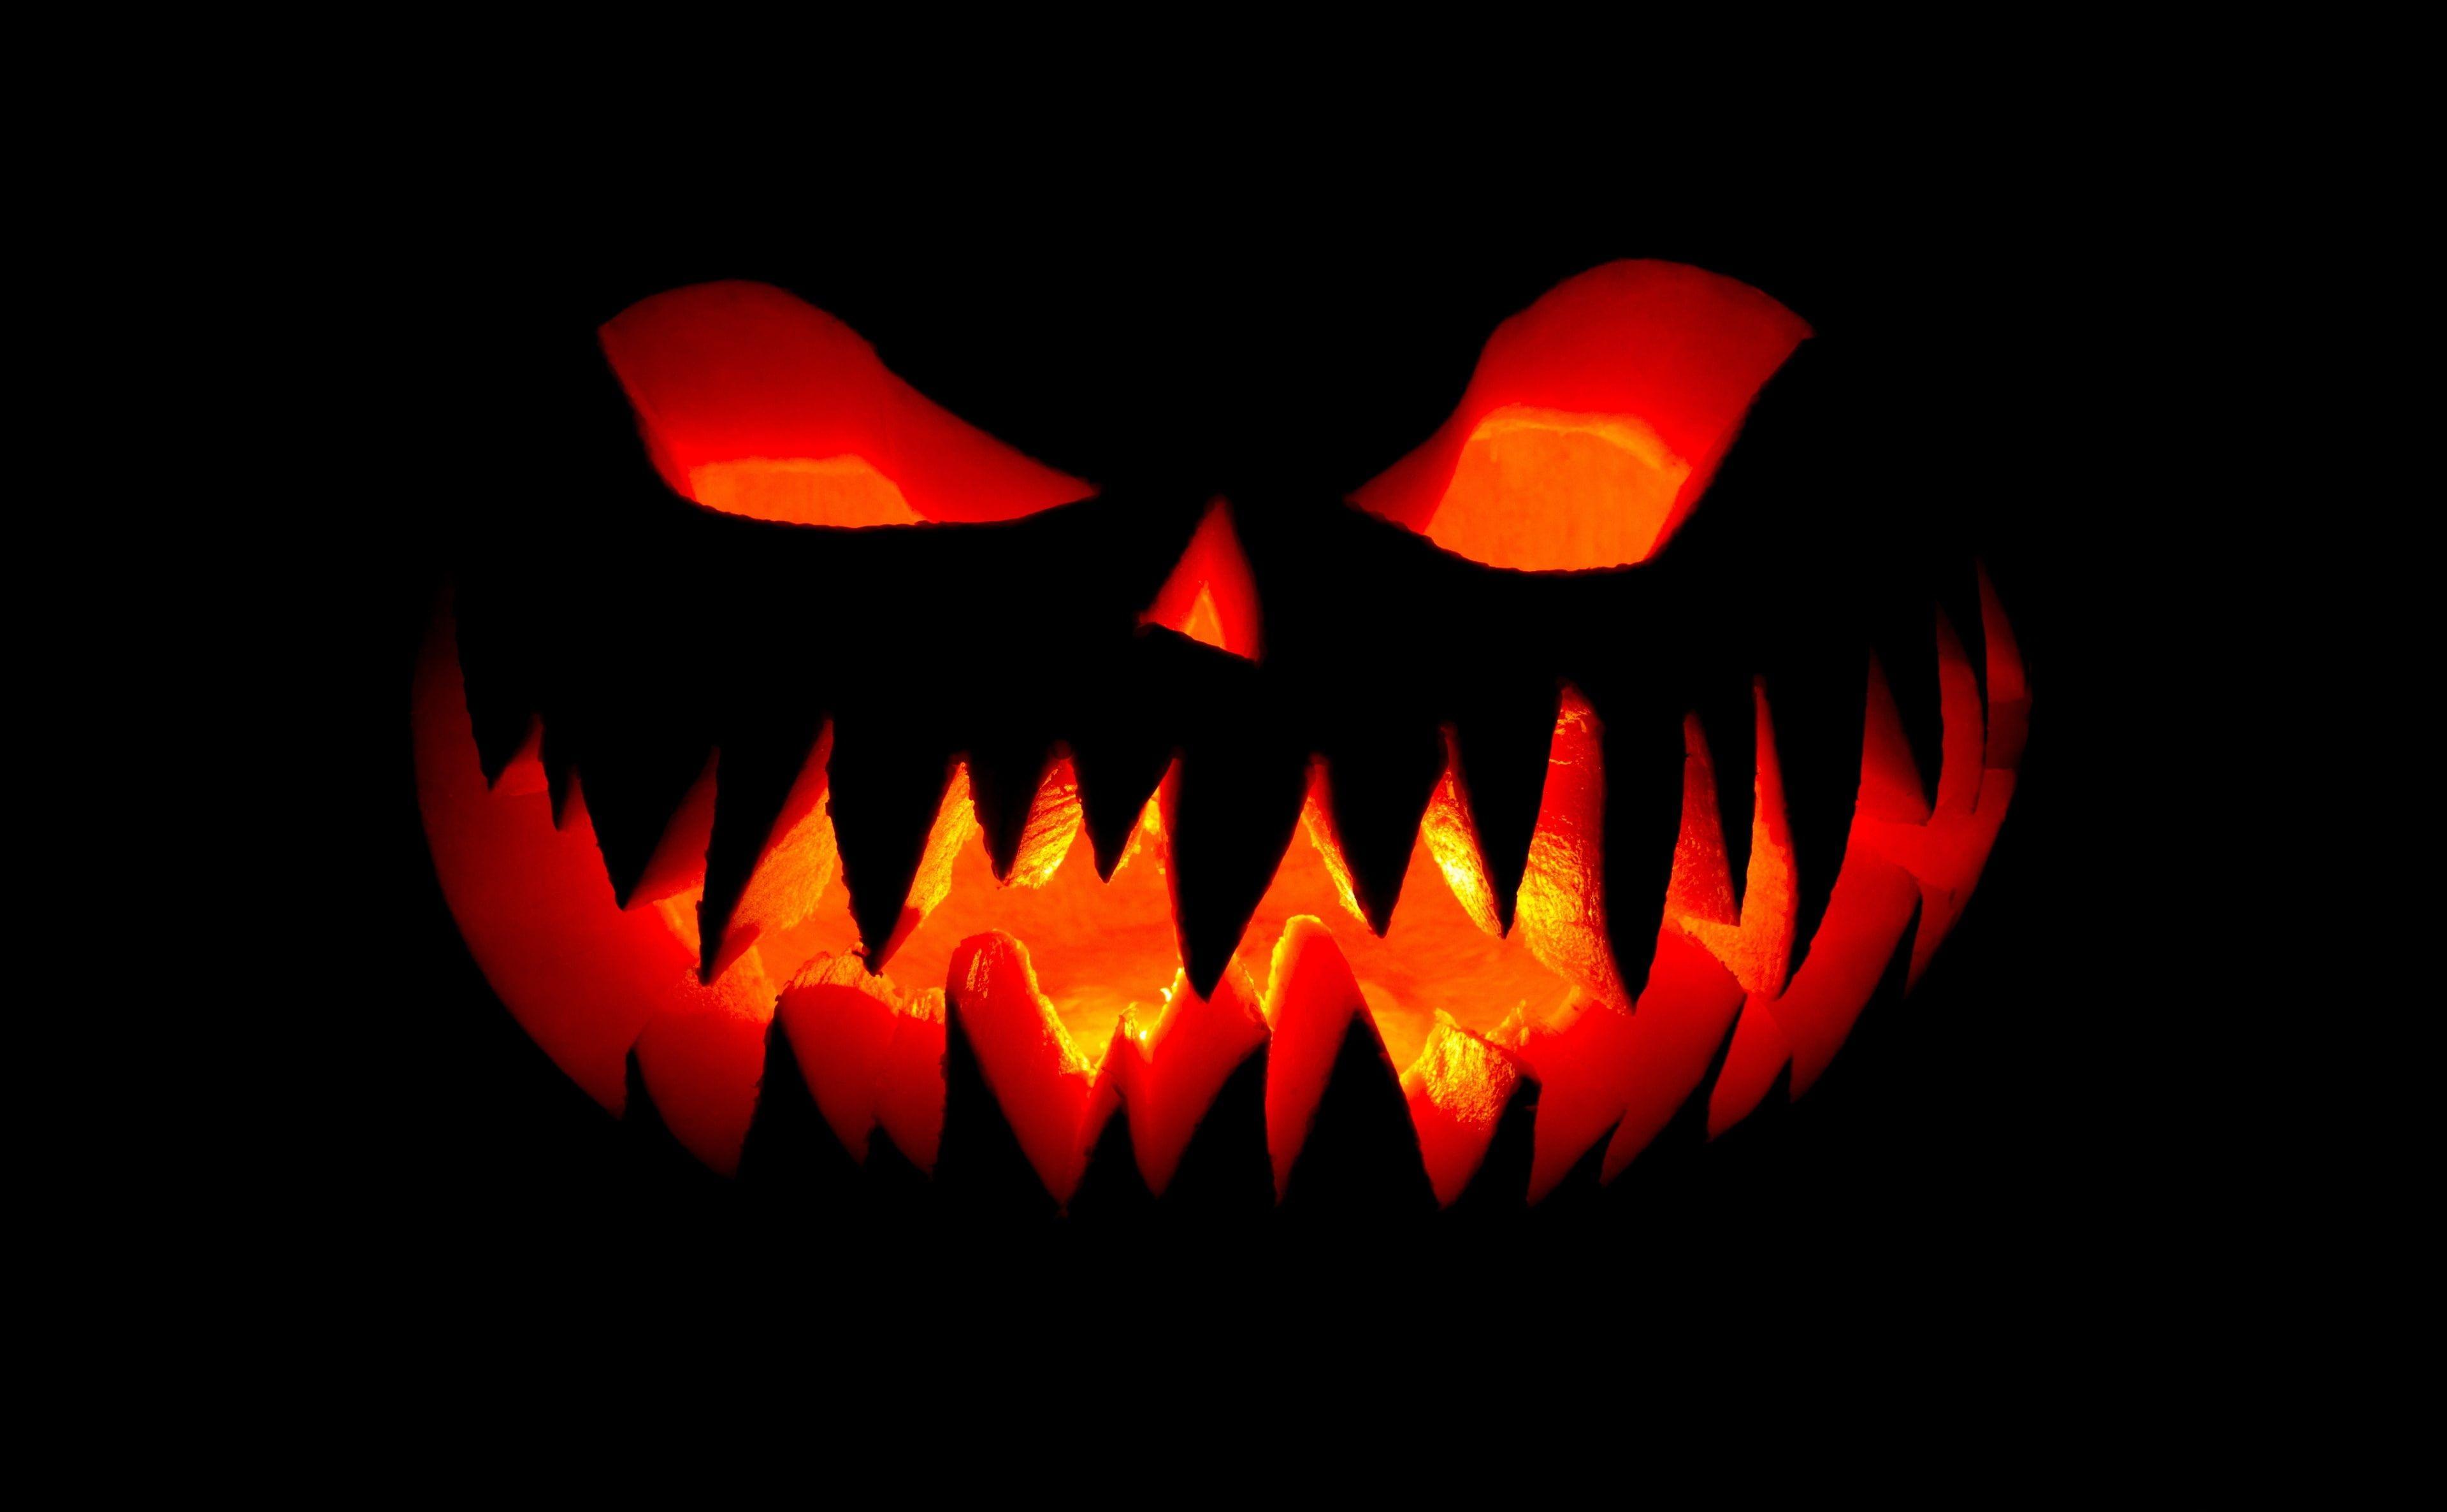 Happy Halloween 2017 Black Jack O Lantern Illustration Holidays Halloween Halloween Wallpaper Backgrounds Halloween Desktop Wallpaper Lantern Illustration